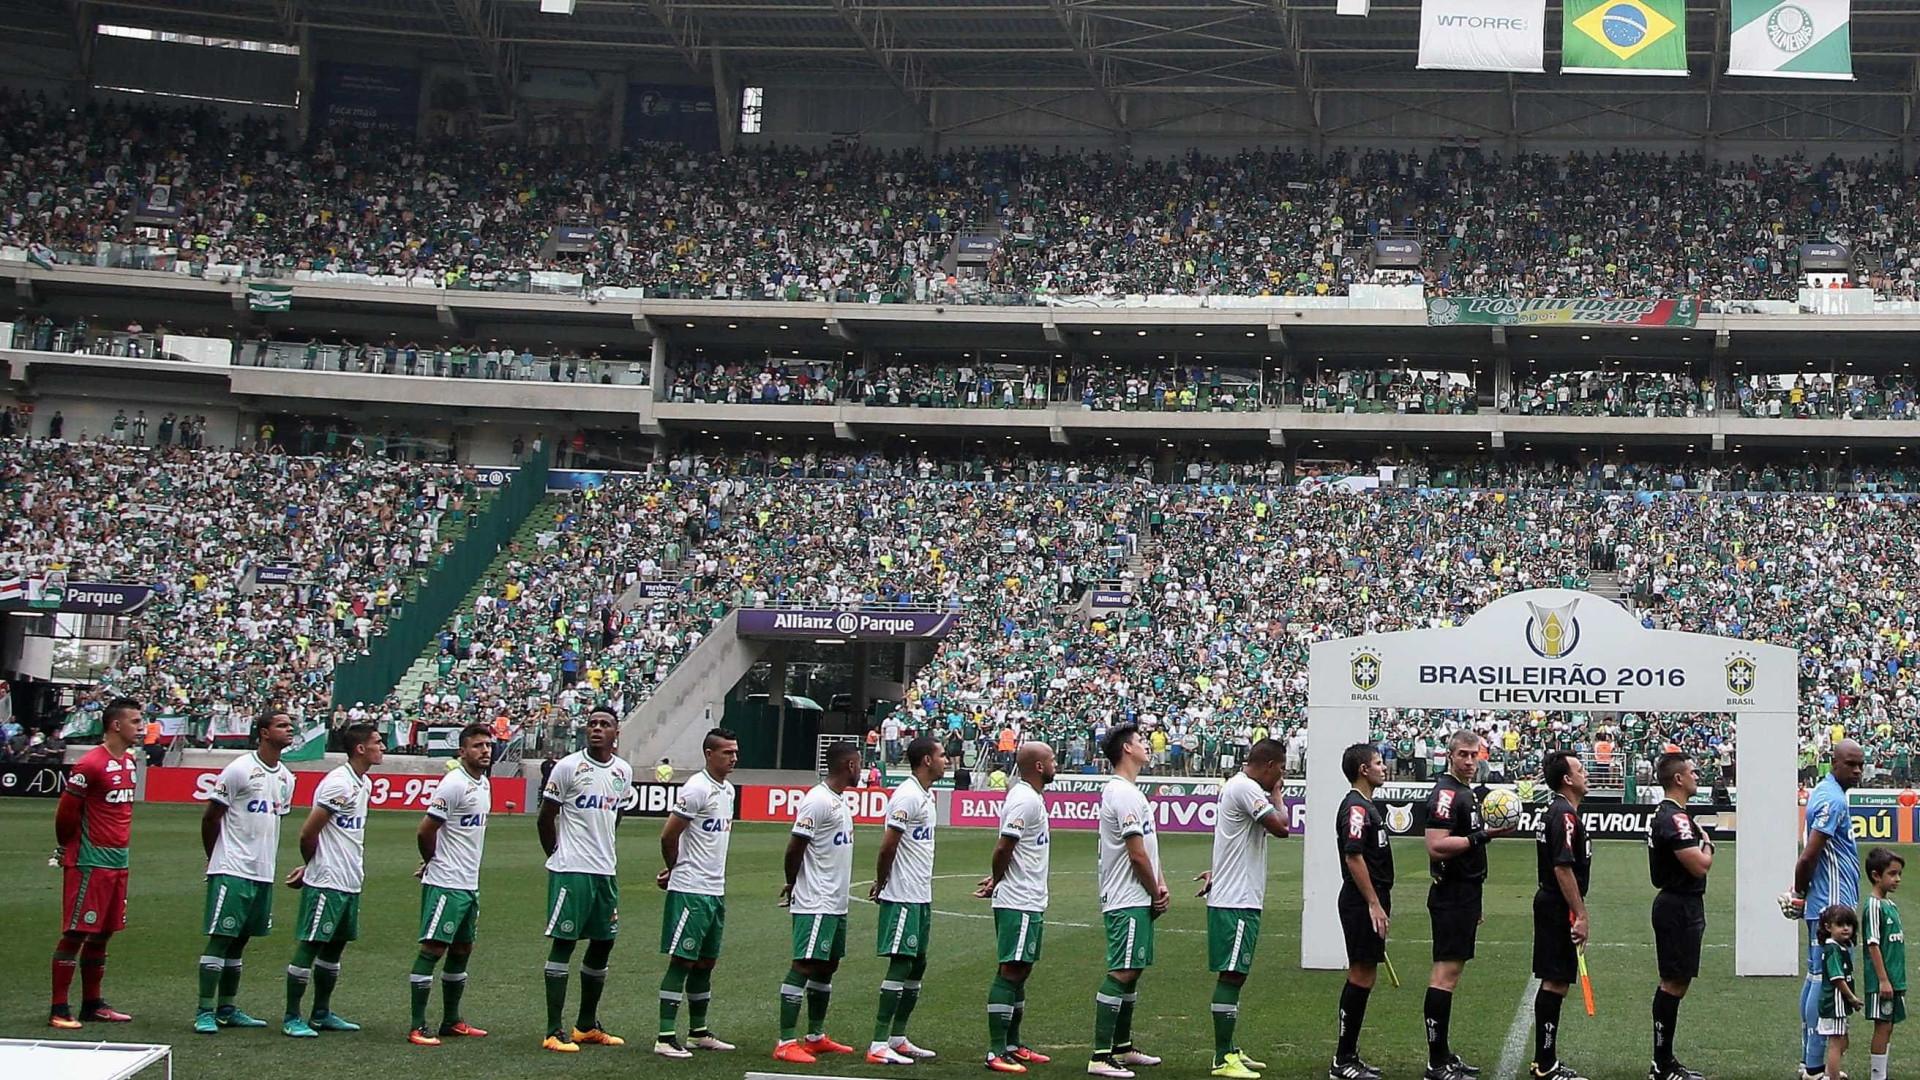 Equipe da Chapecoense mudou de  voo após veto da Anac